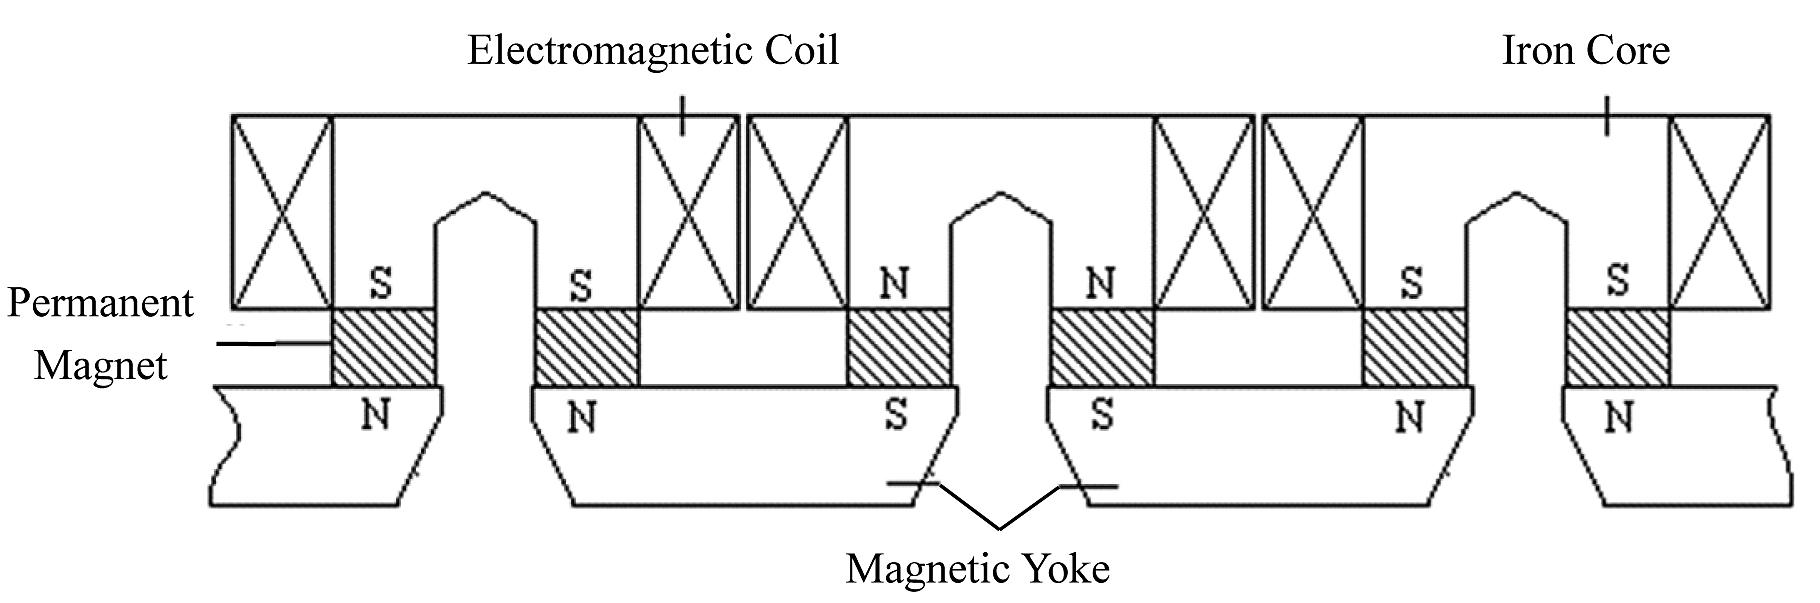 A novel design of electromagnetic levitation system for high-speed